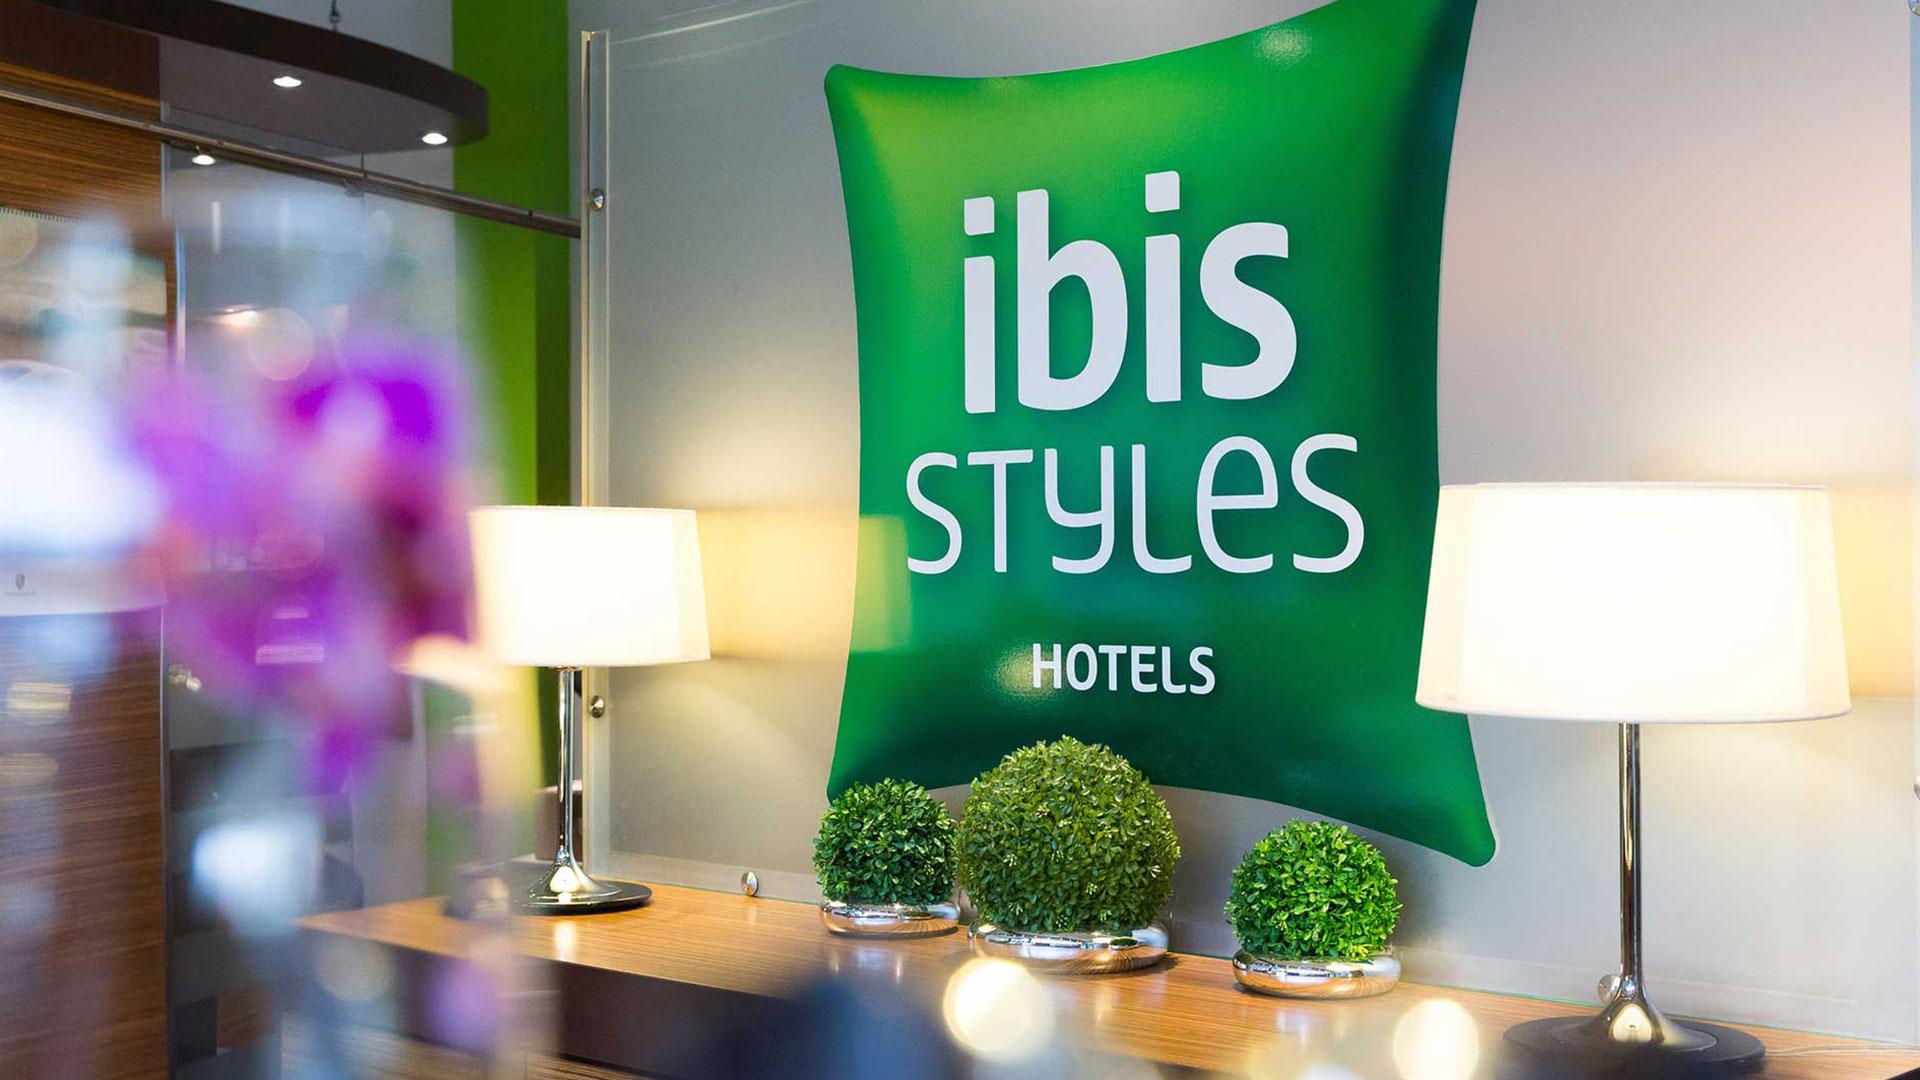 Foto der Lobby - 01 - ibis Styles Leipzig